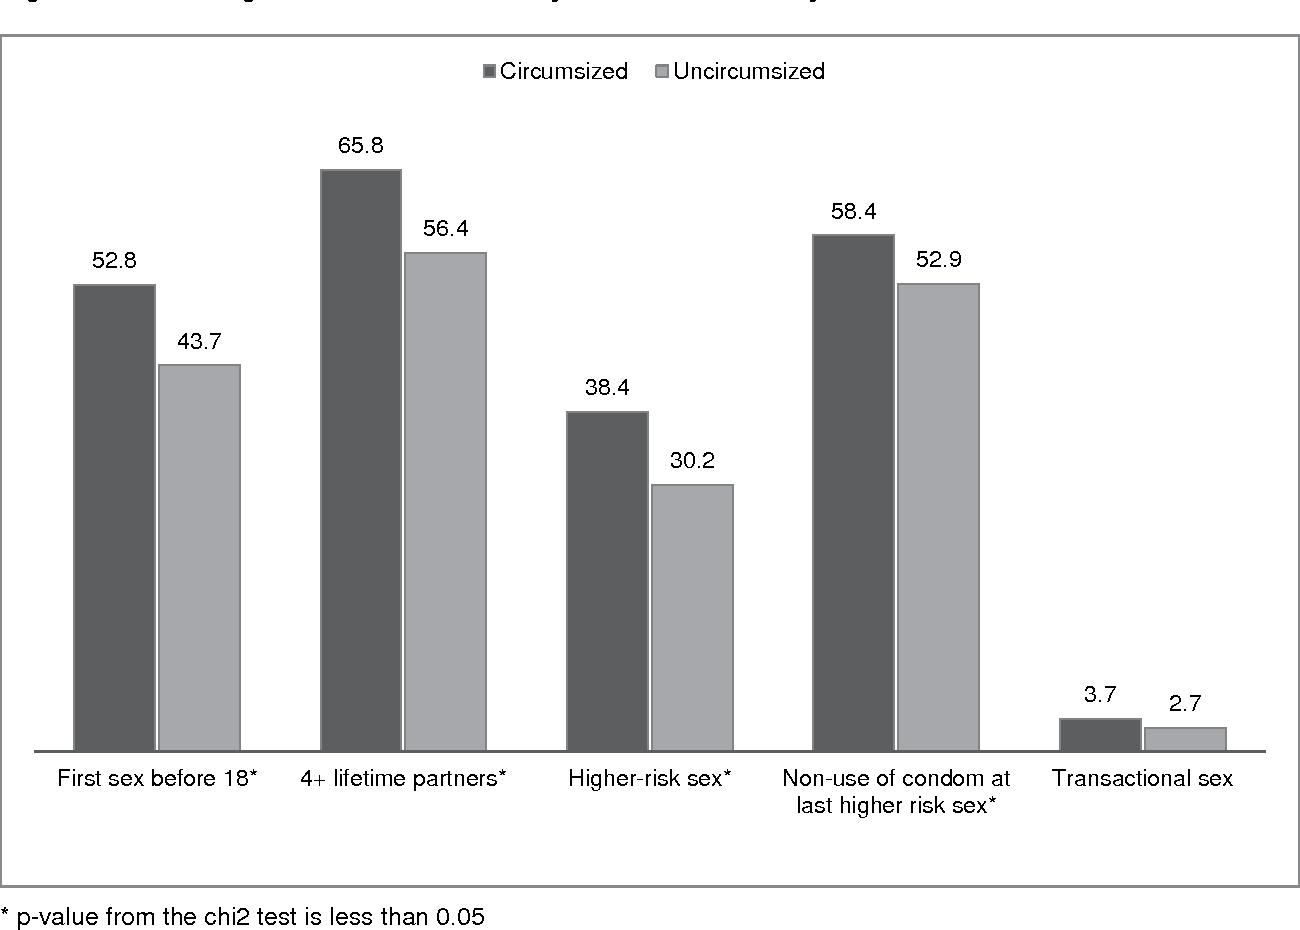 Figure 3. Percentage of men who had risky sexual behavior by circumcision status